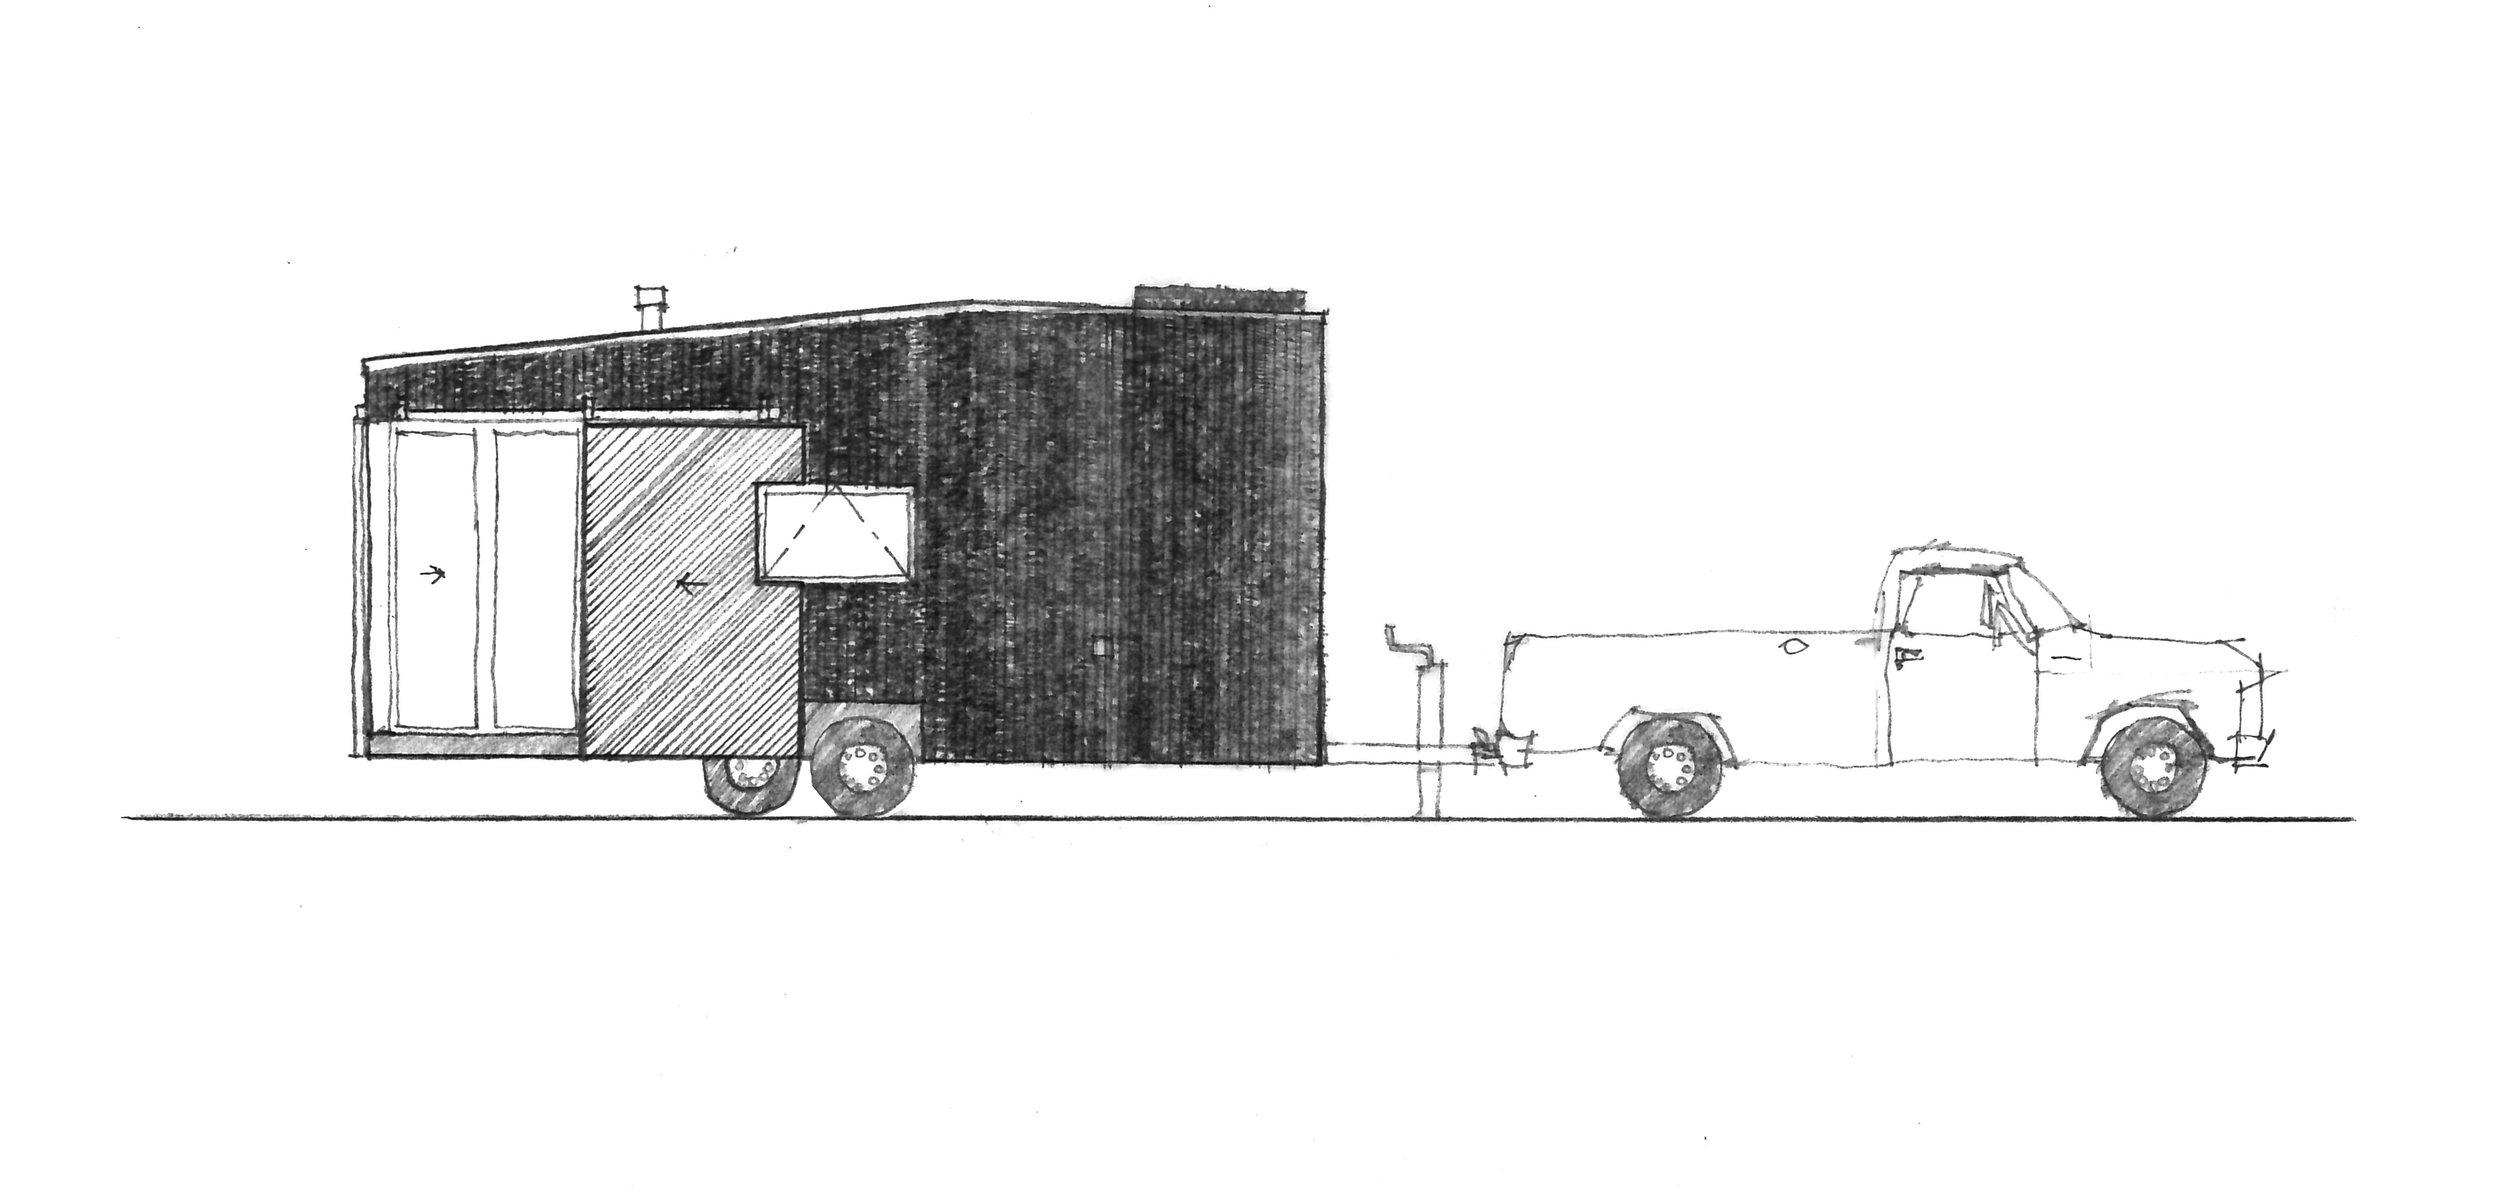 truck+and+trailer+sketch.jpg